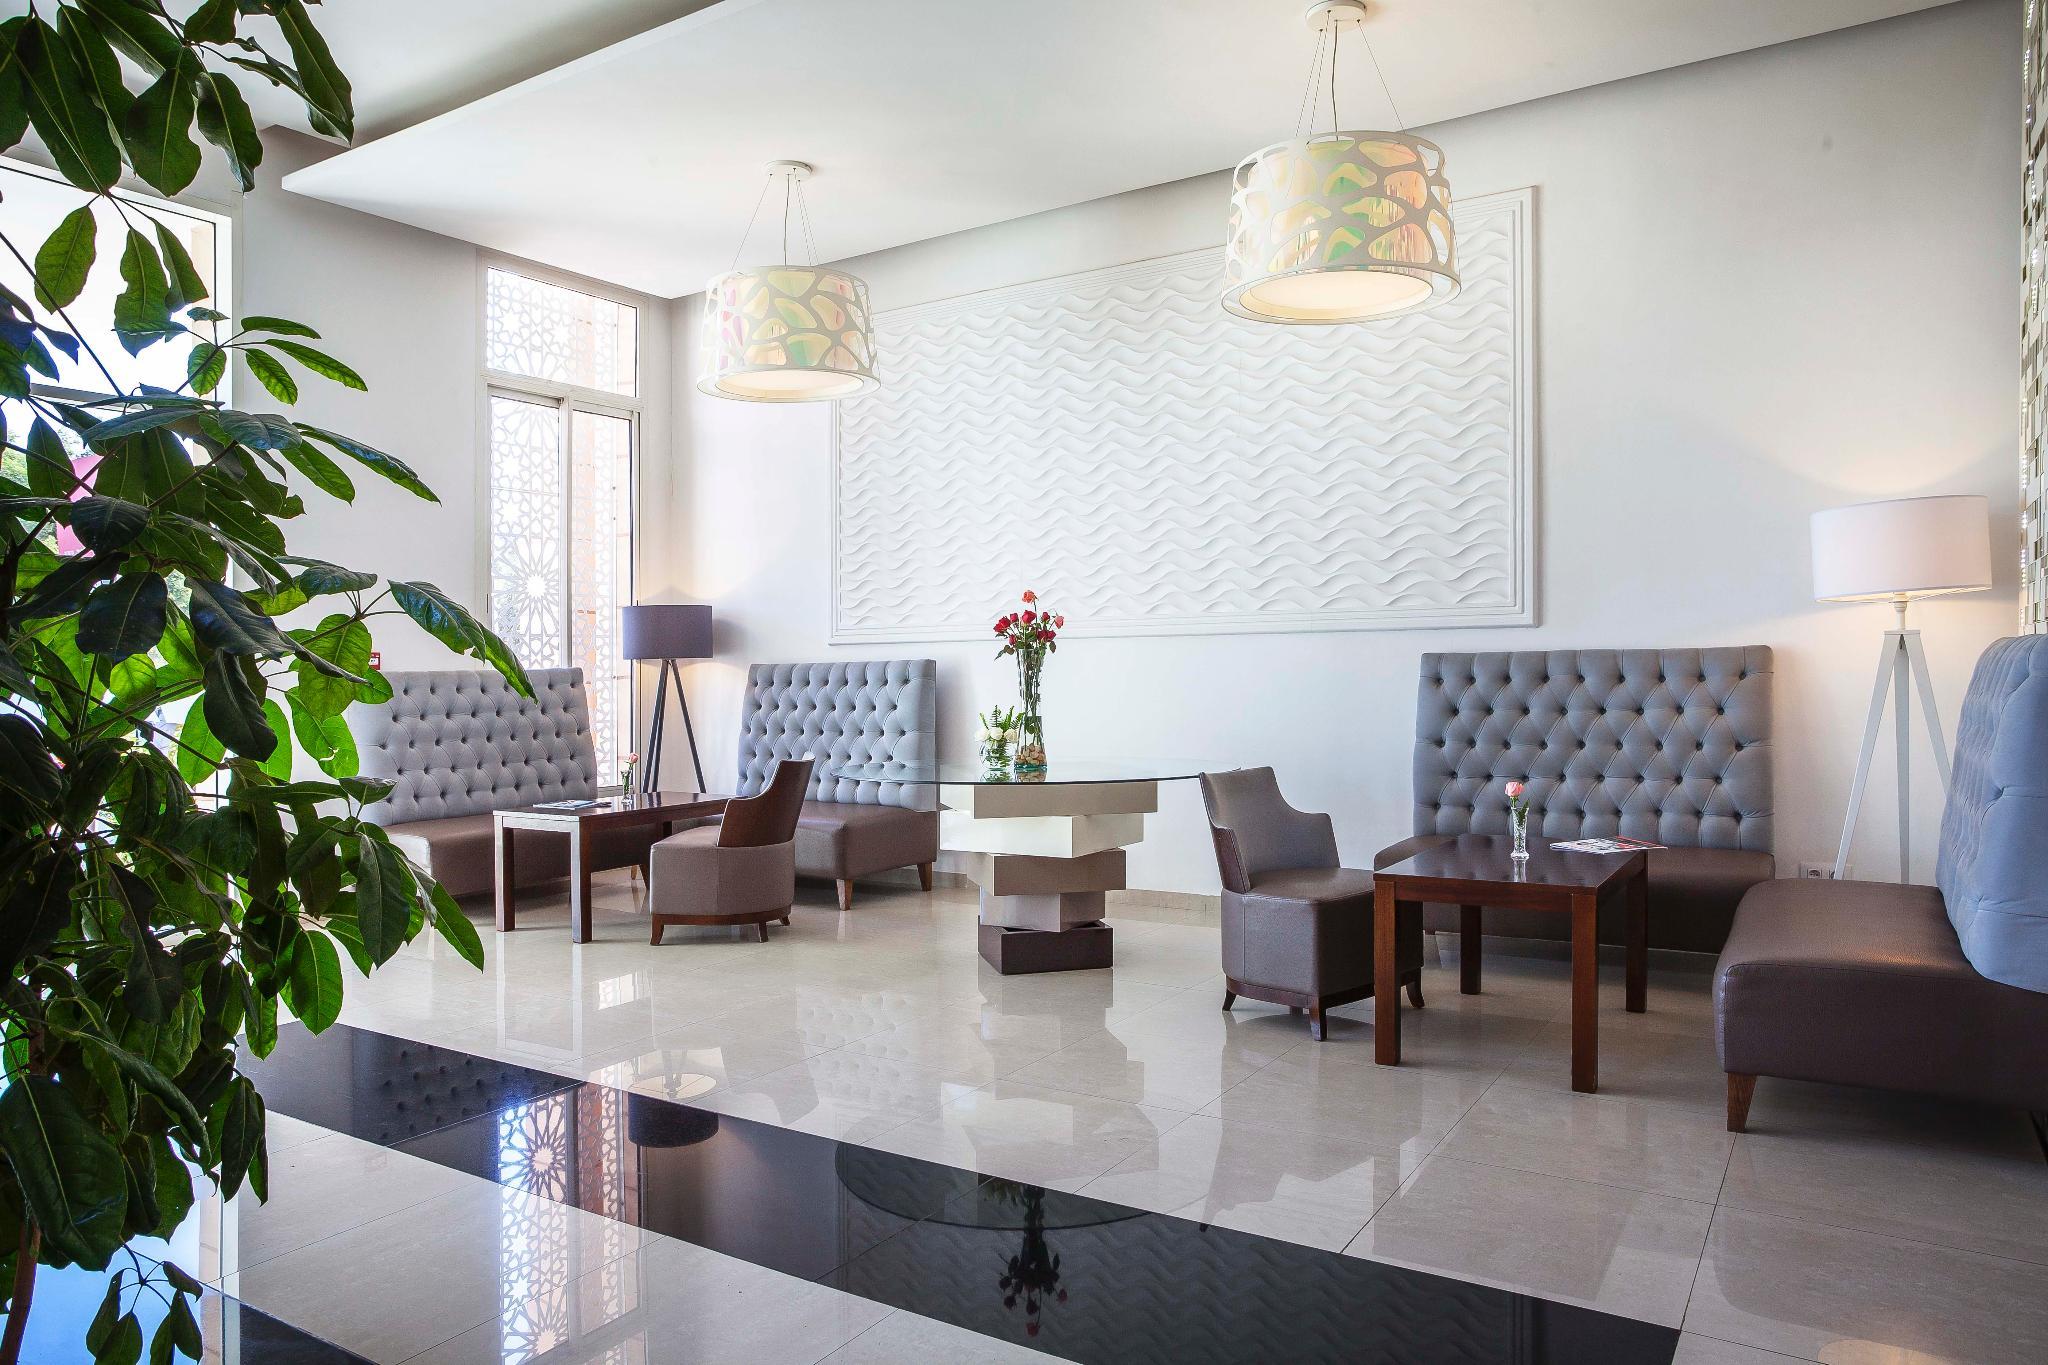 Kenitra Gharb Chrarda Beni Hssen Morocco relax hotel kenitra in gharb-chrarda-beni hssen (region